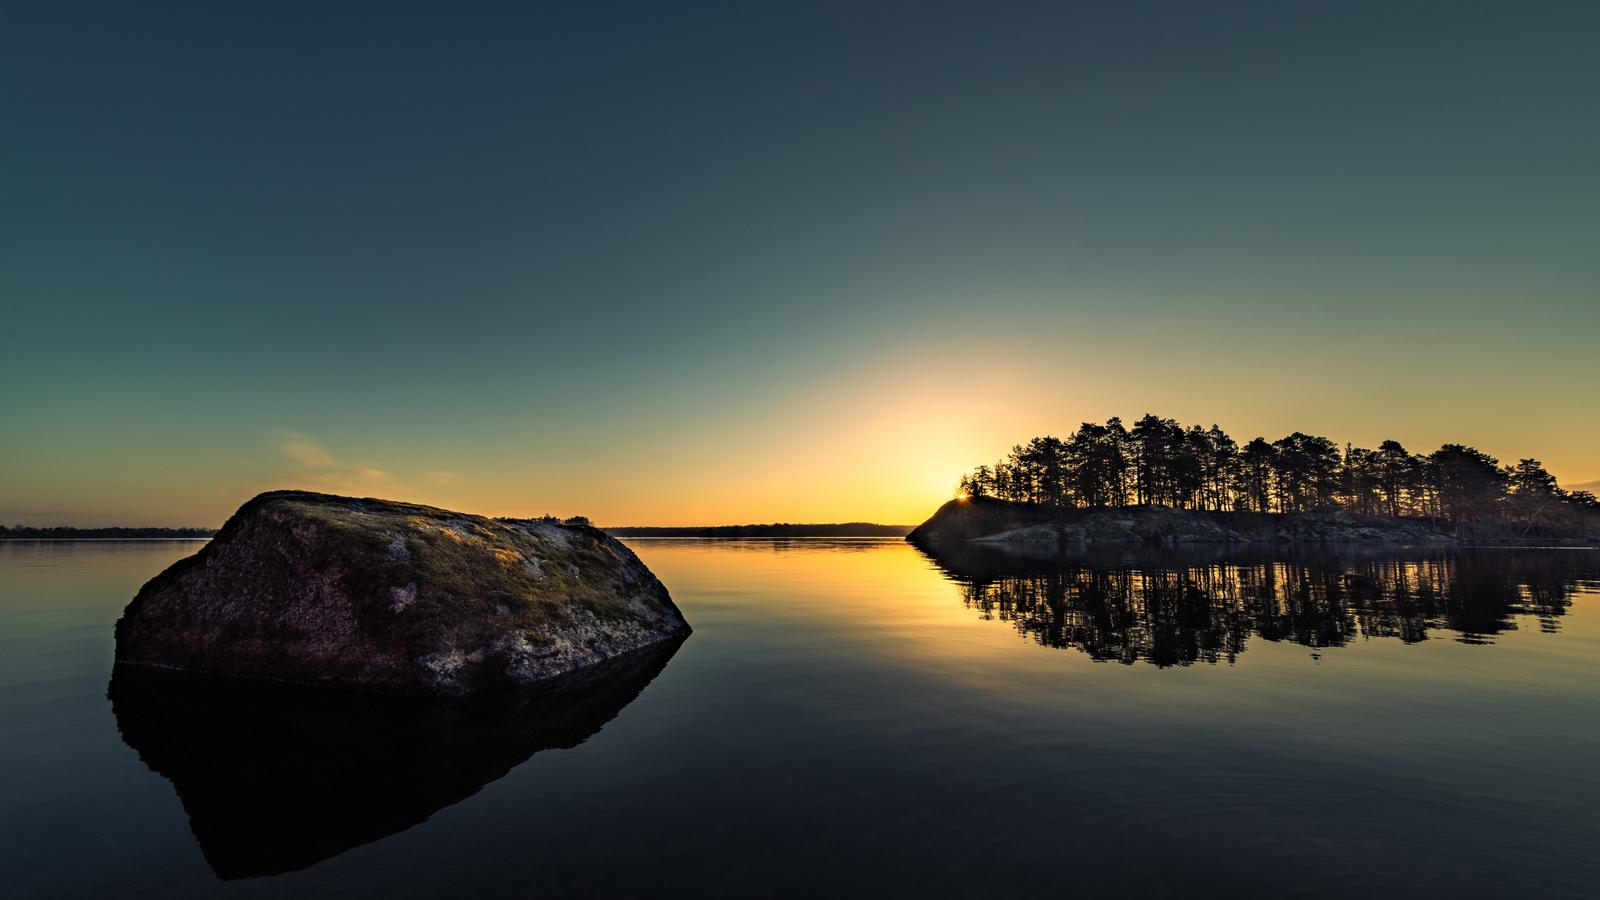 lake-side-dawn-5k-2q.jpg